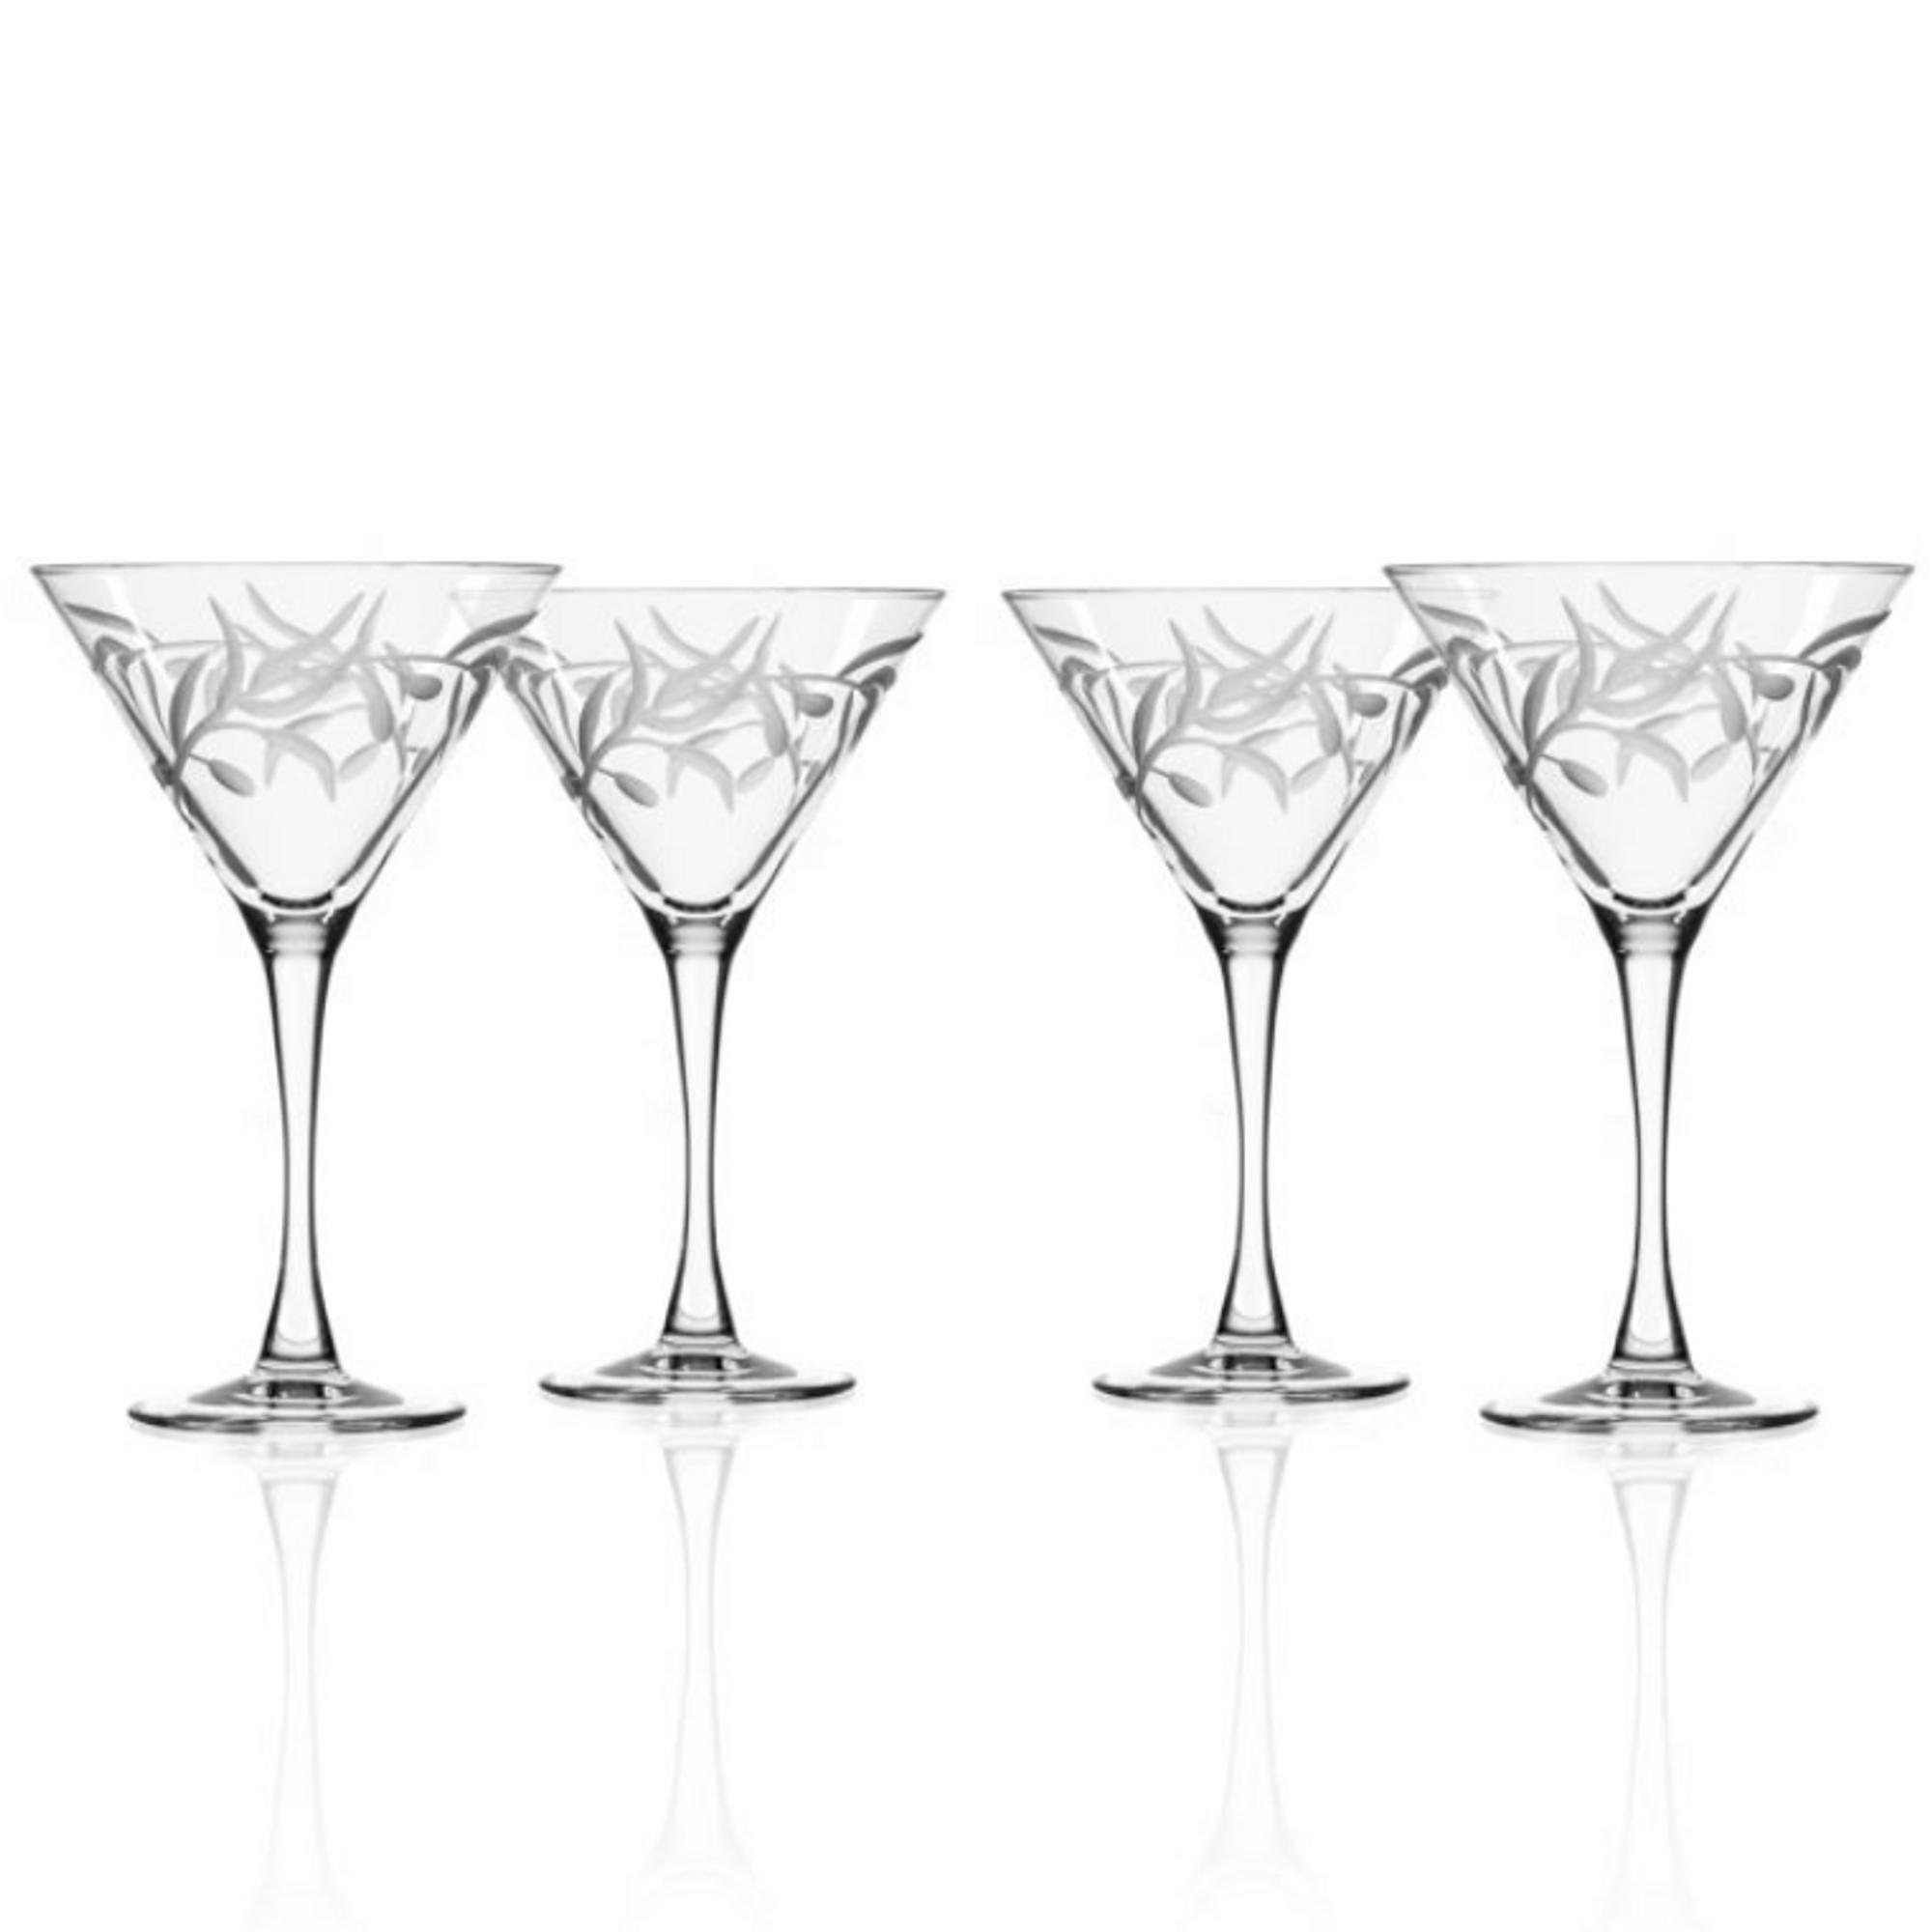 Olive Branch Martini Glass Set Engraved Olive Branch